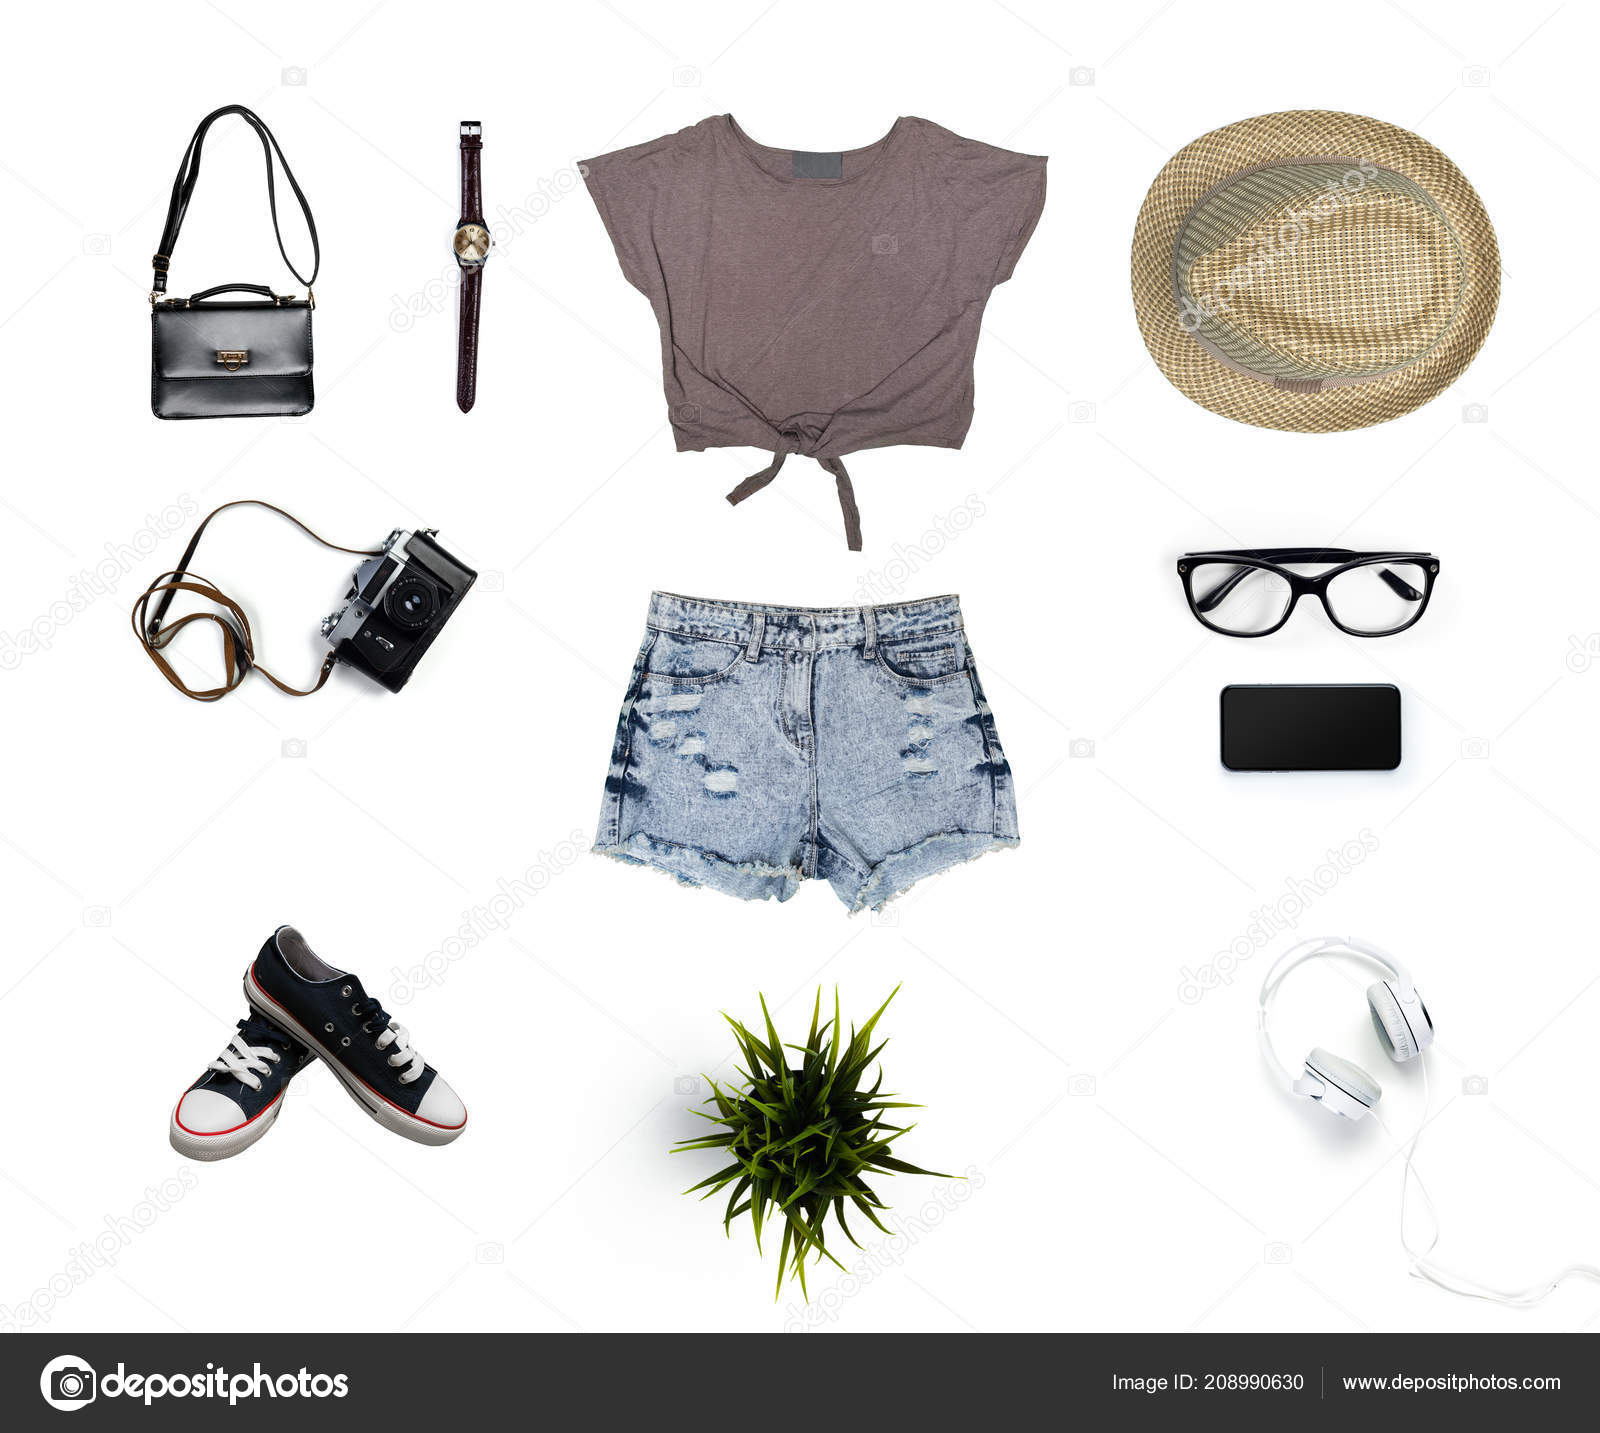 87099a2bdb2 Κολάζ Γυναικεία Ρούχα Που Απομονώνονται Λευκό Φόντο — Φωτογραφία ...